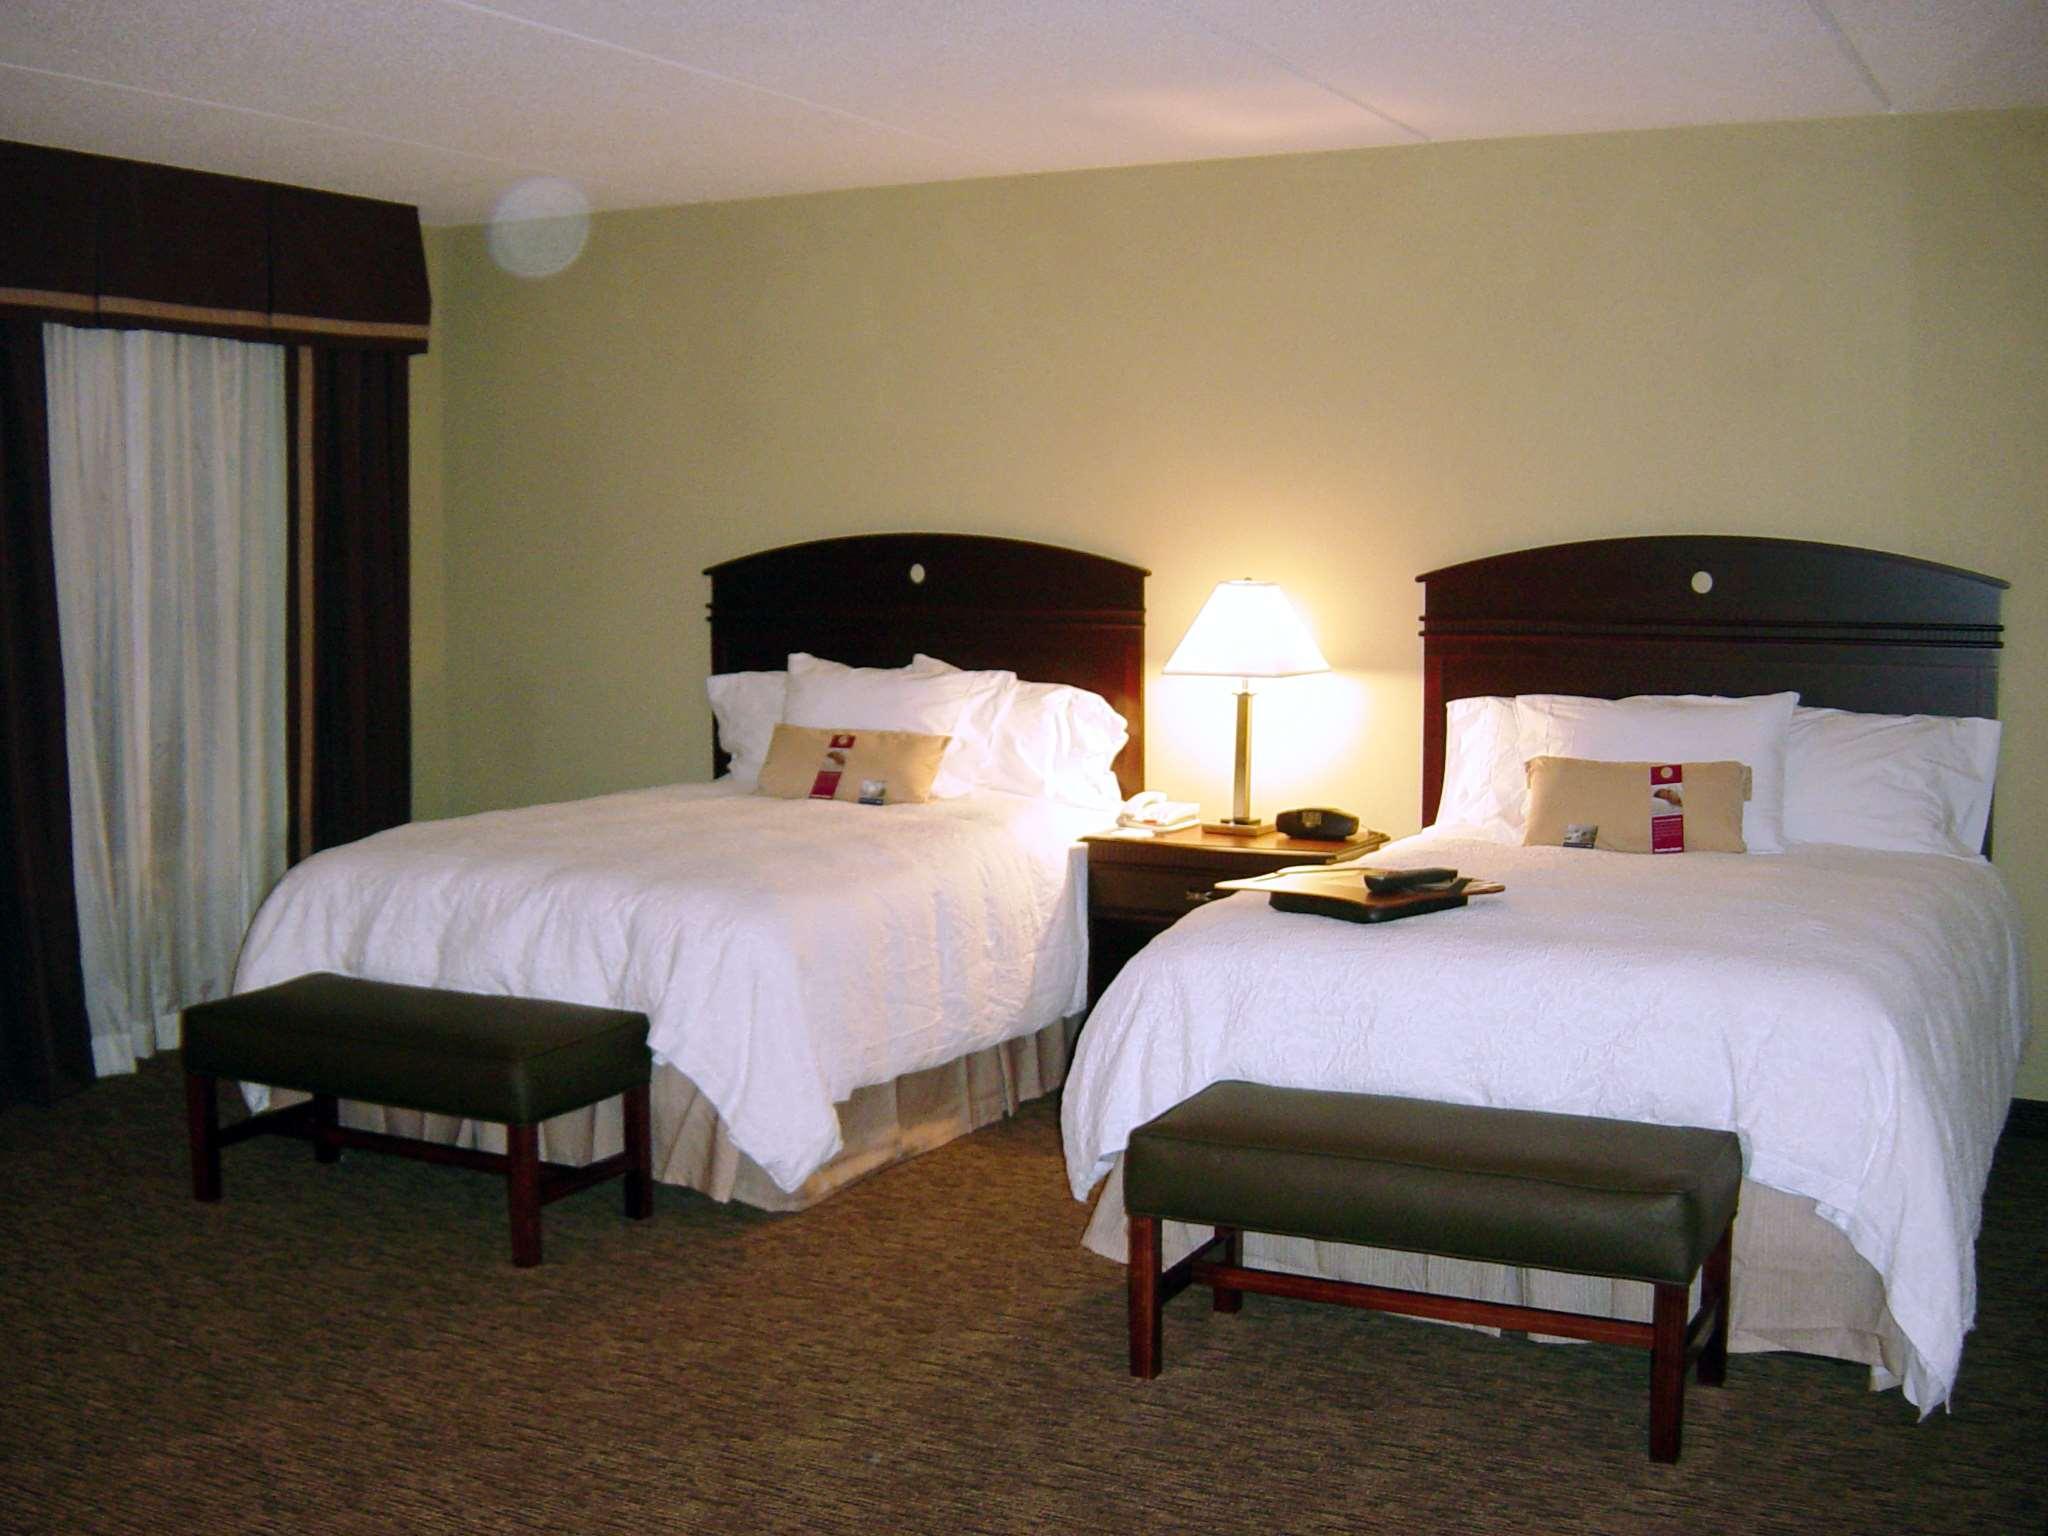 Hampton Inn & Suites Burlington image 18